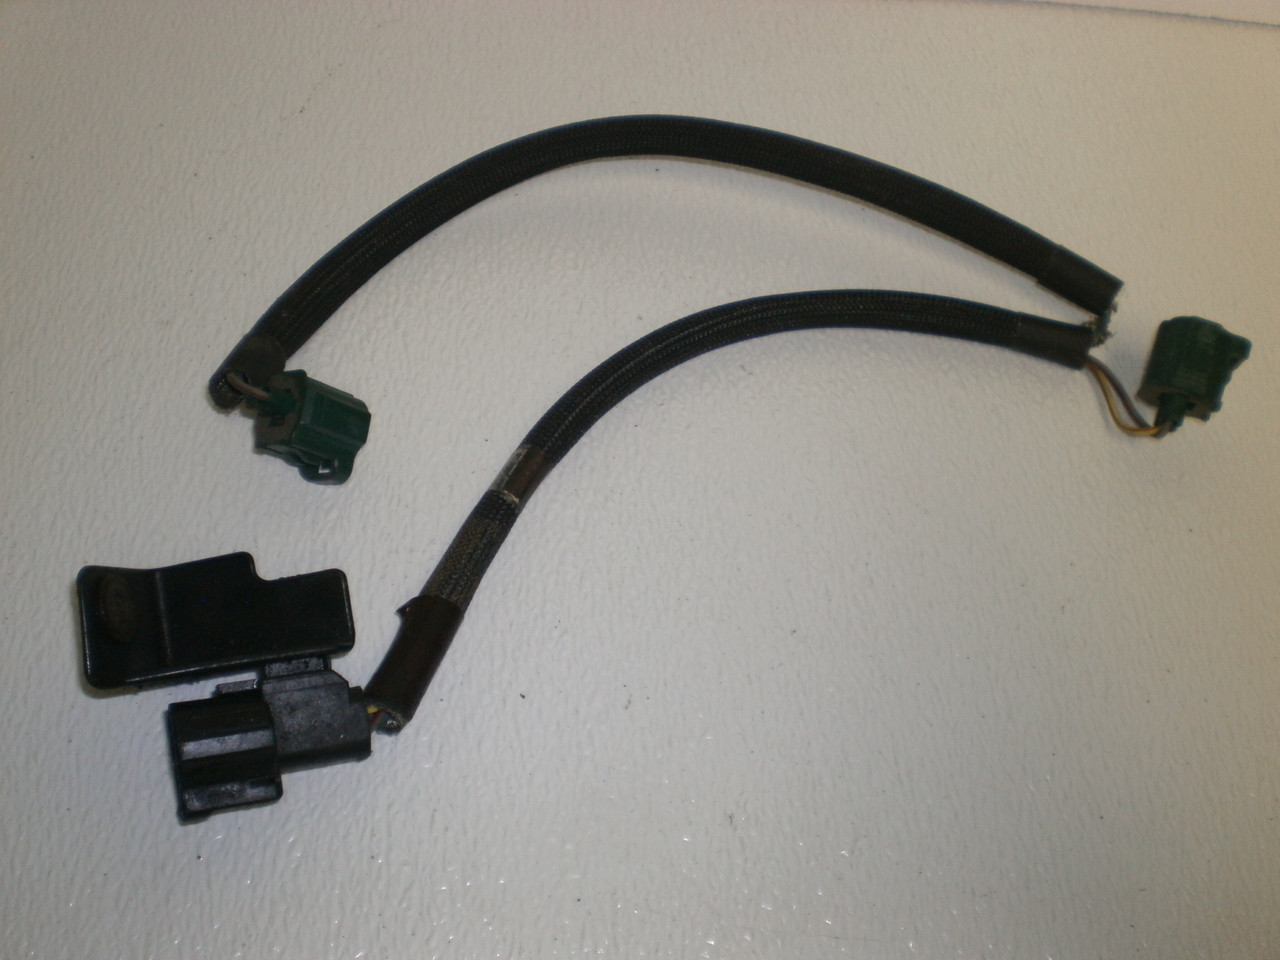 1996 1998 Ford Mustang 46 Crank Timing Sprocket V8 Knock Sensor Wire Harness Larger More Photos